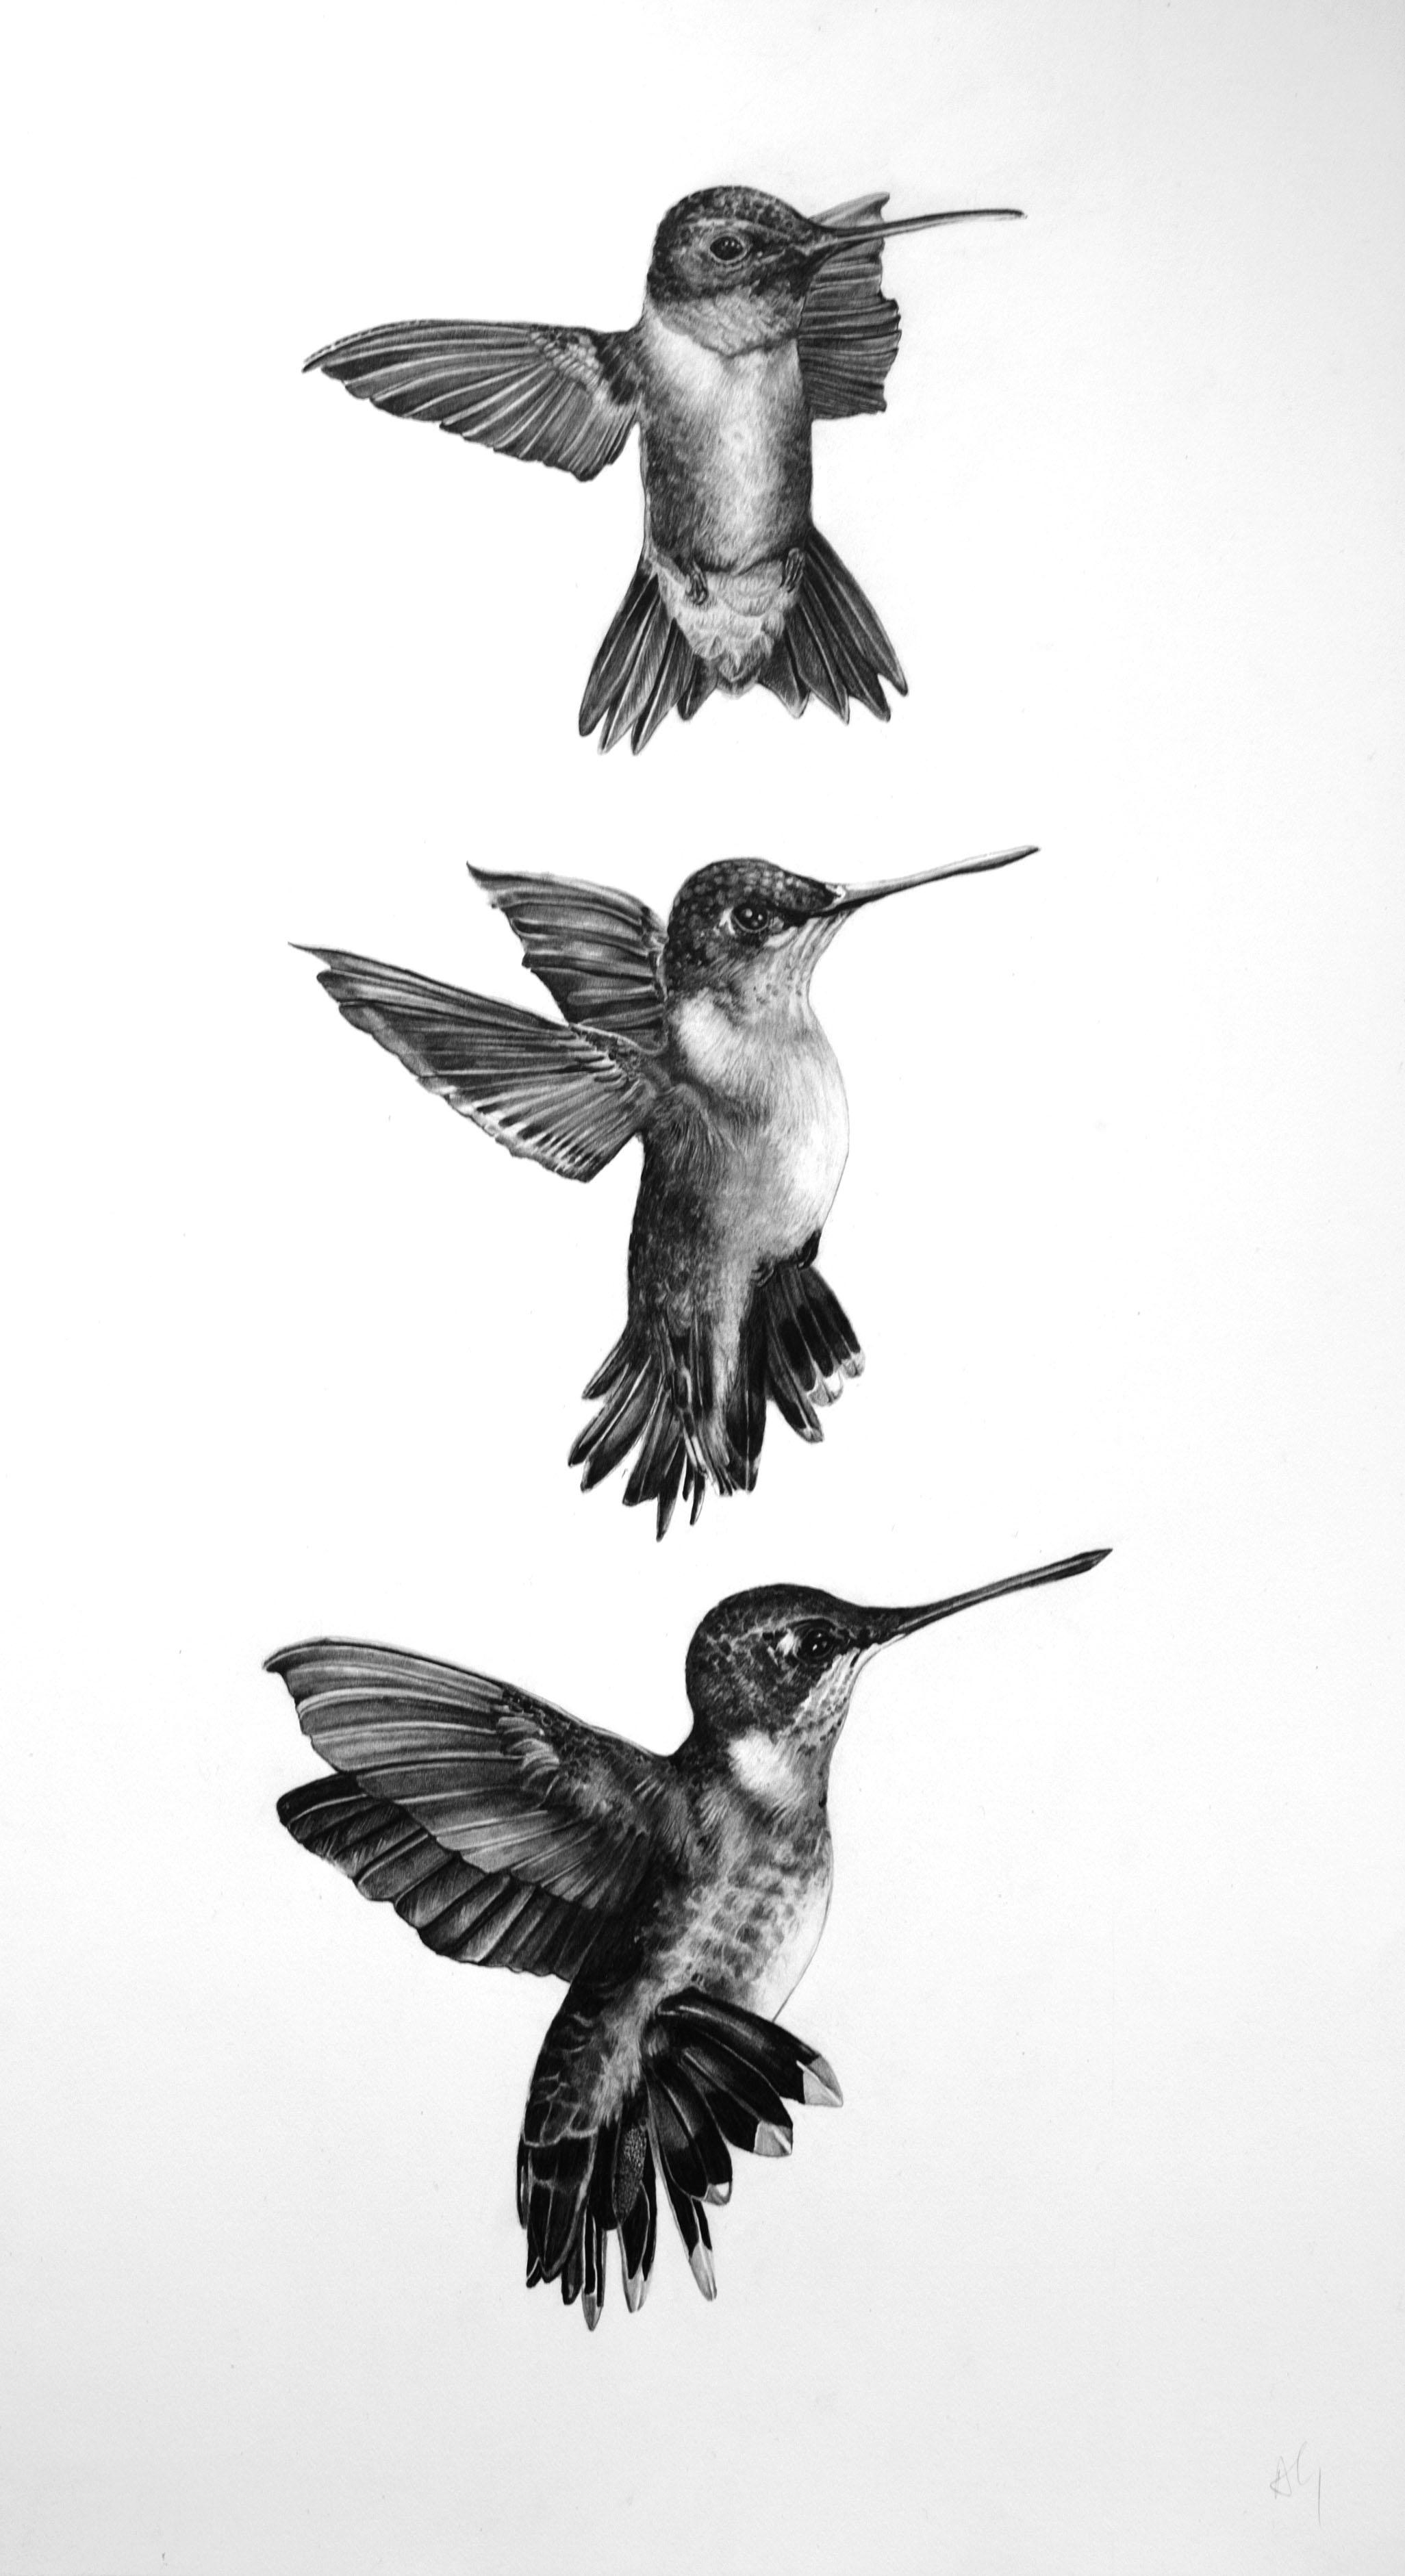 alicia-gradonhummingbird-trio-1.png